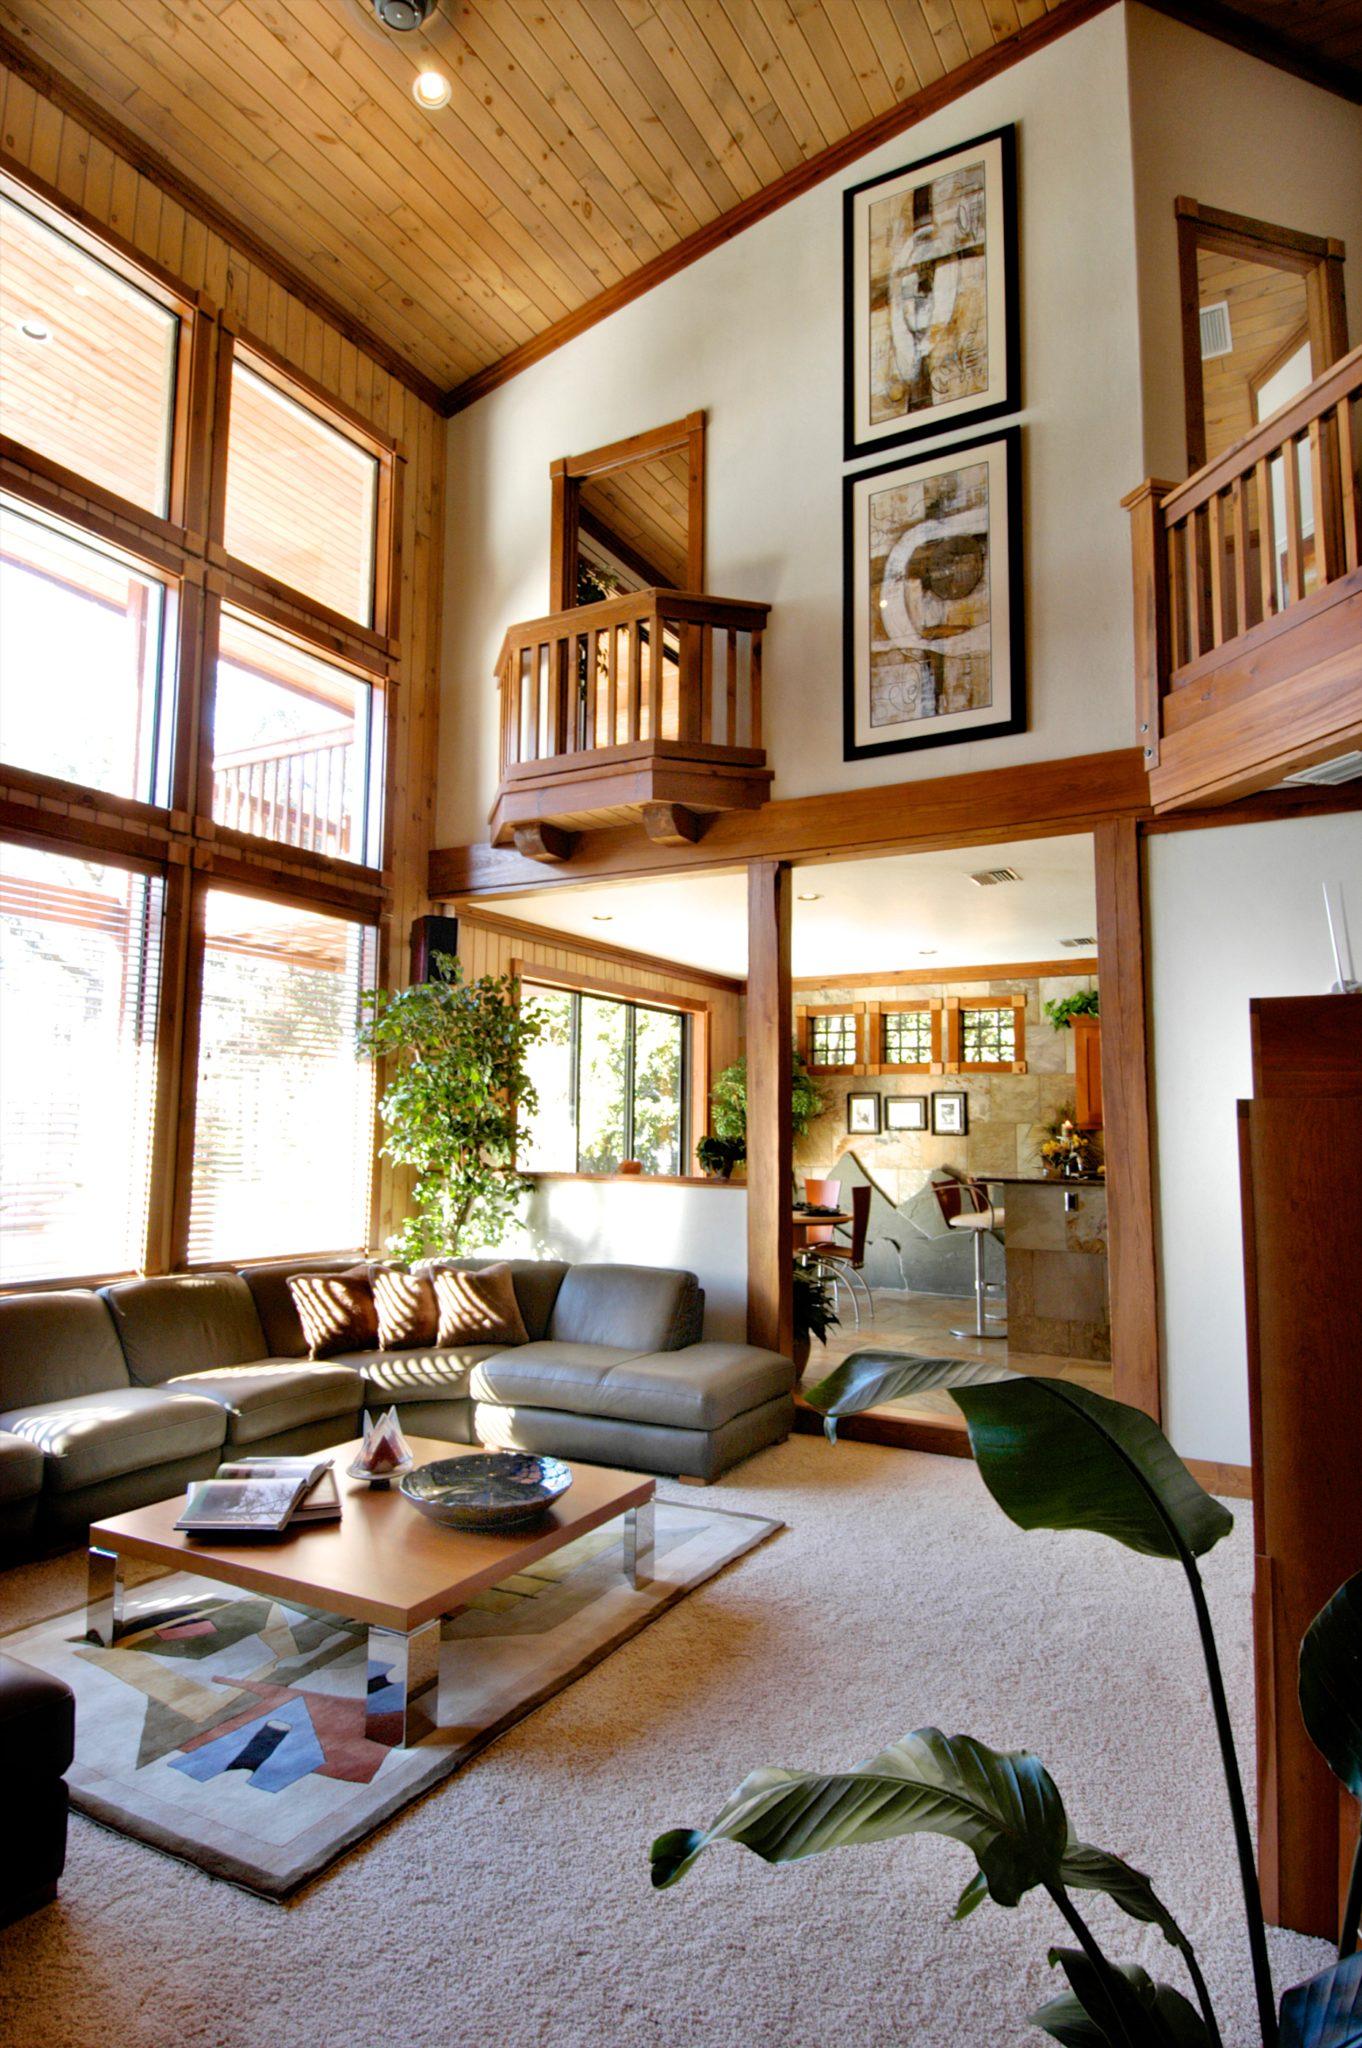 Interior design byBarbara Krai Interior Design